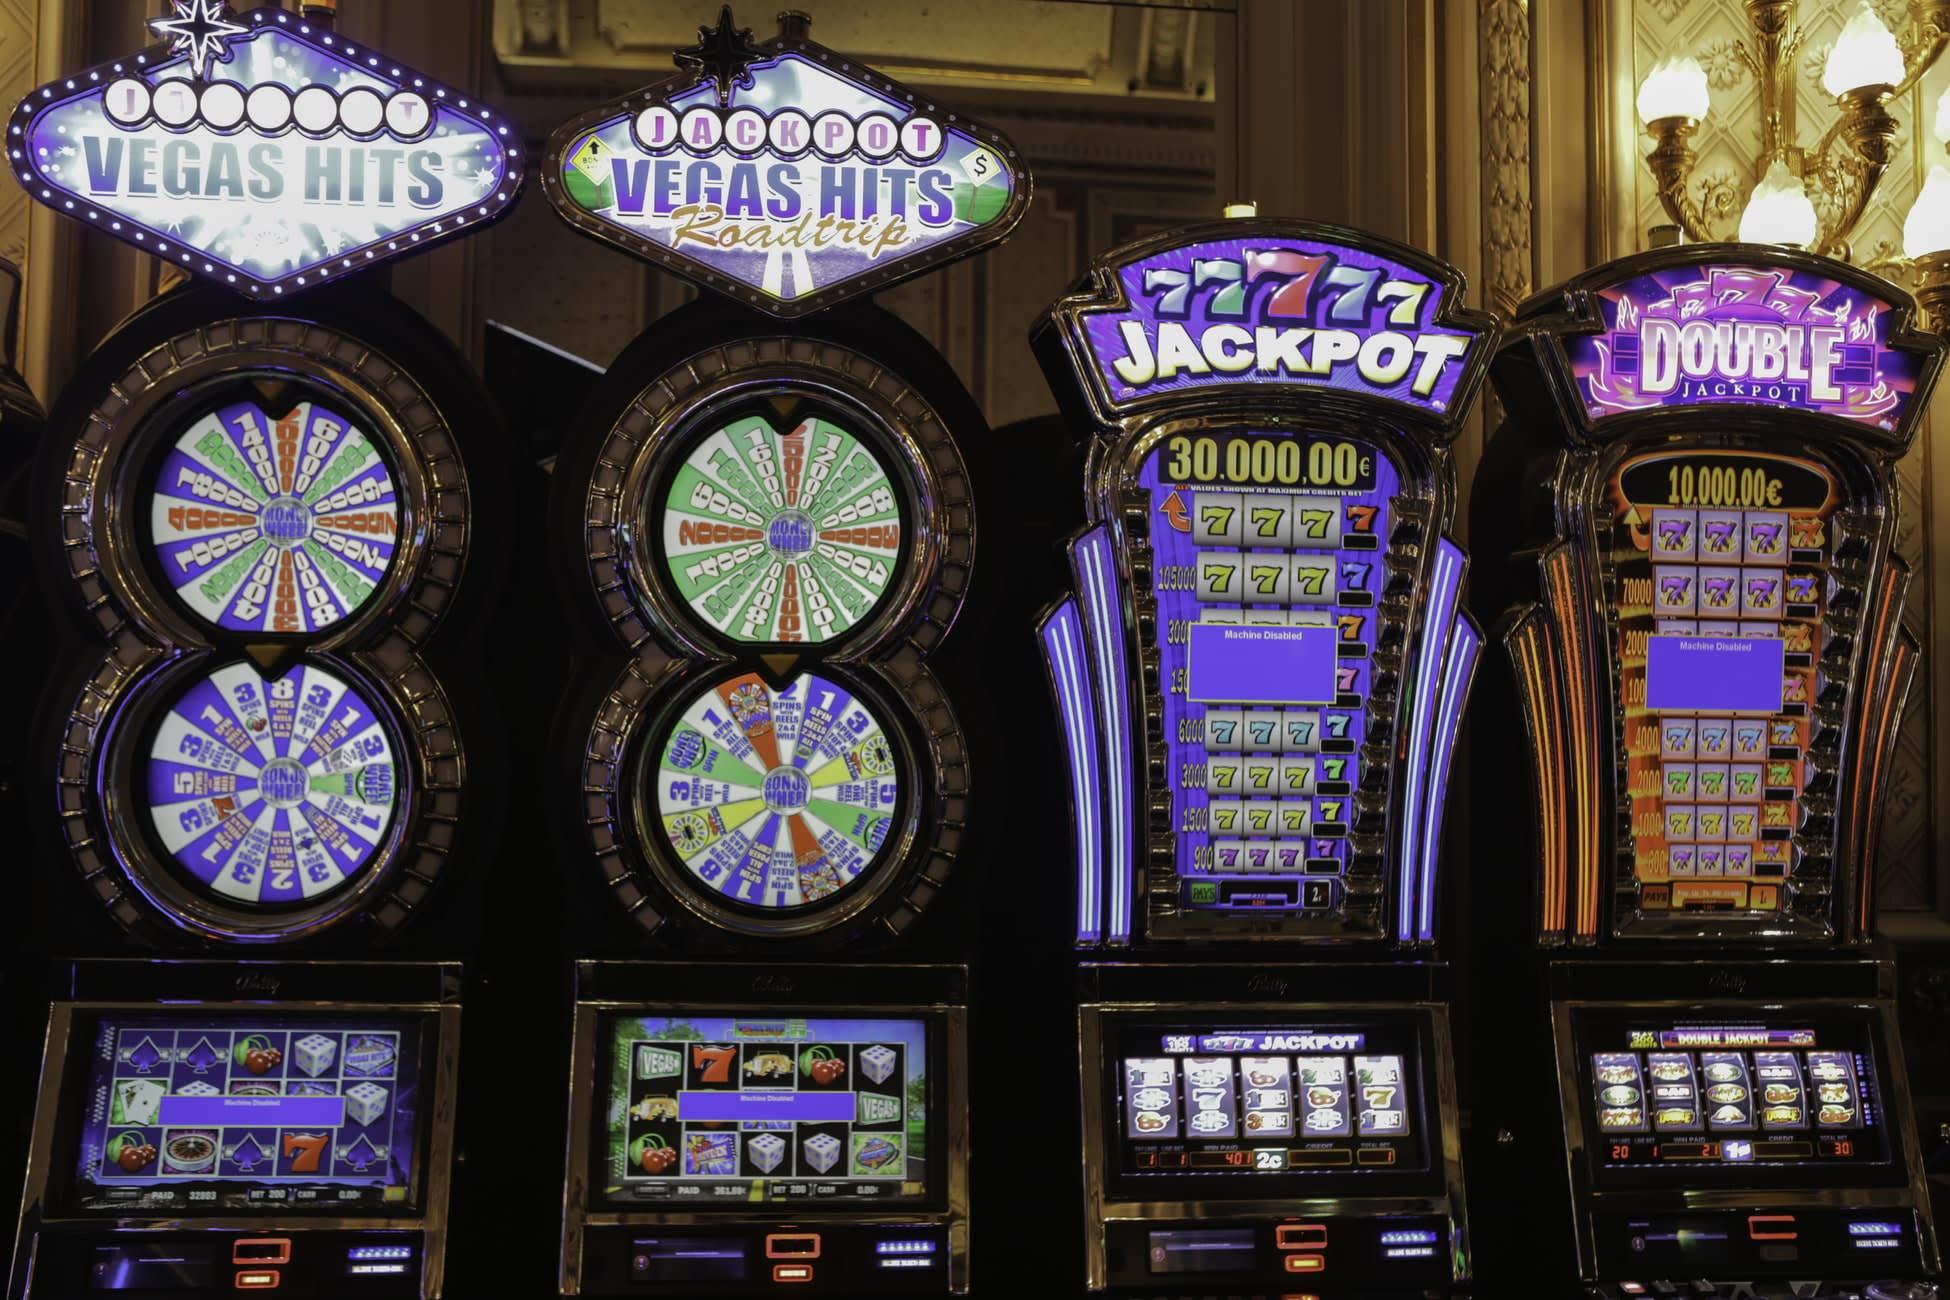 Buzz Bingo and Playtech bring slot tournaments